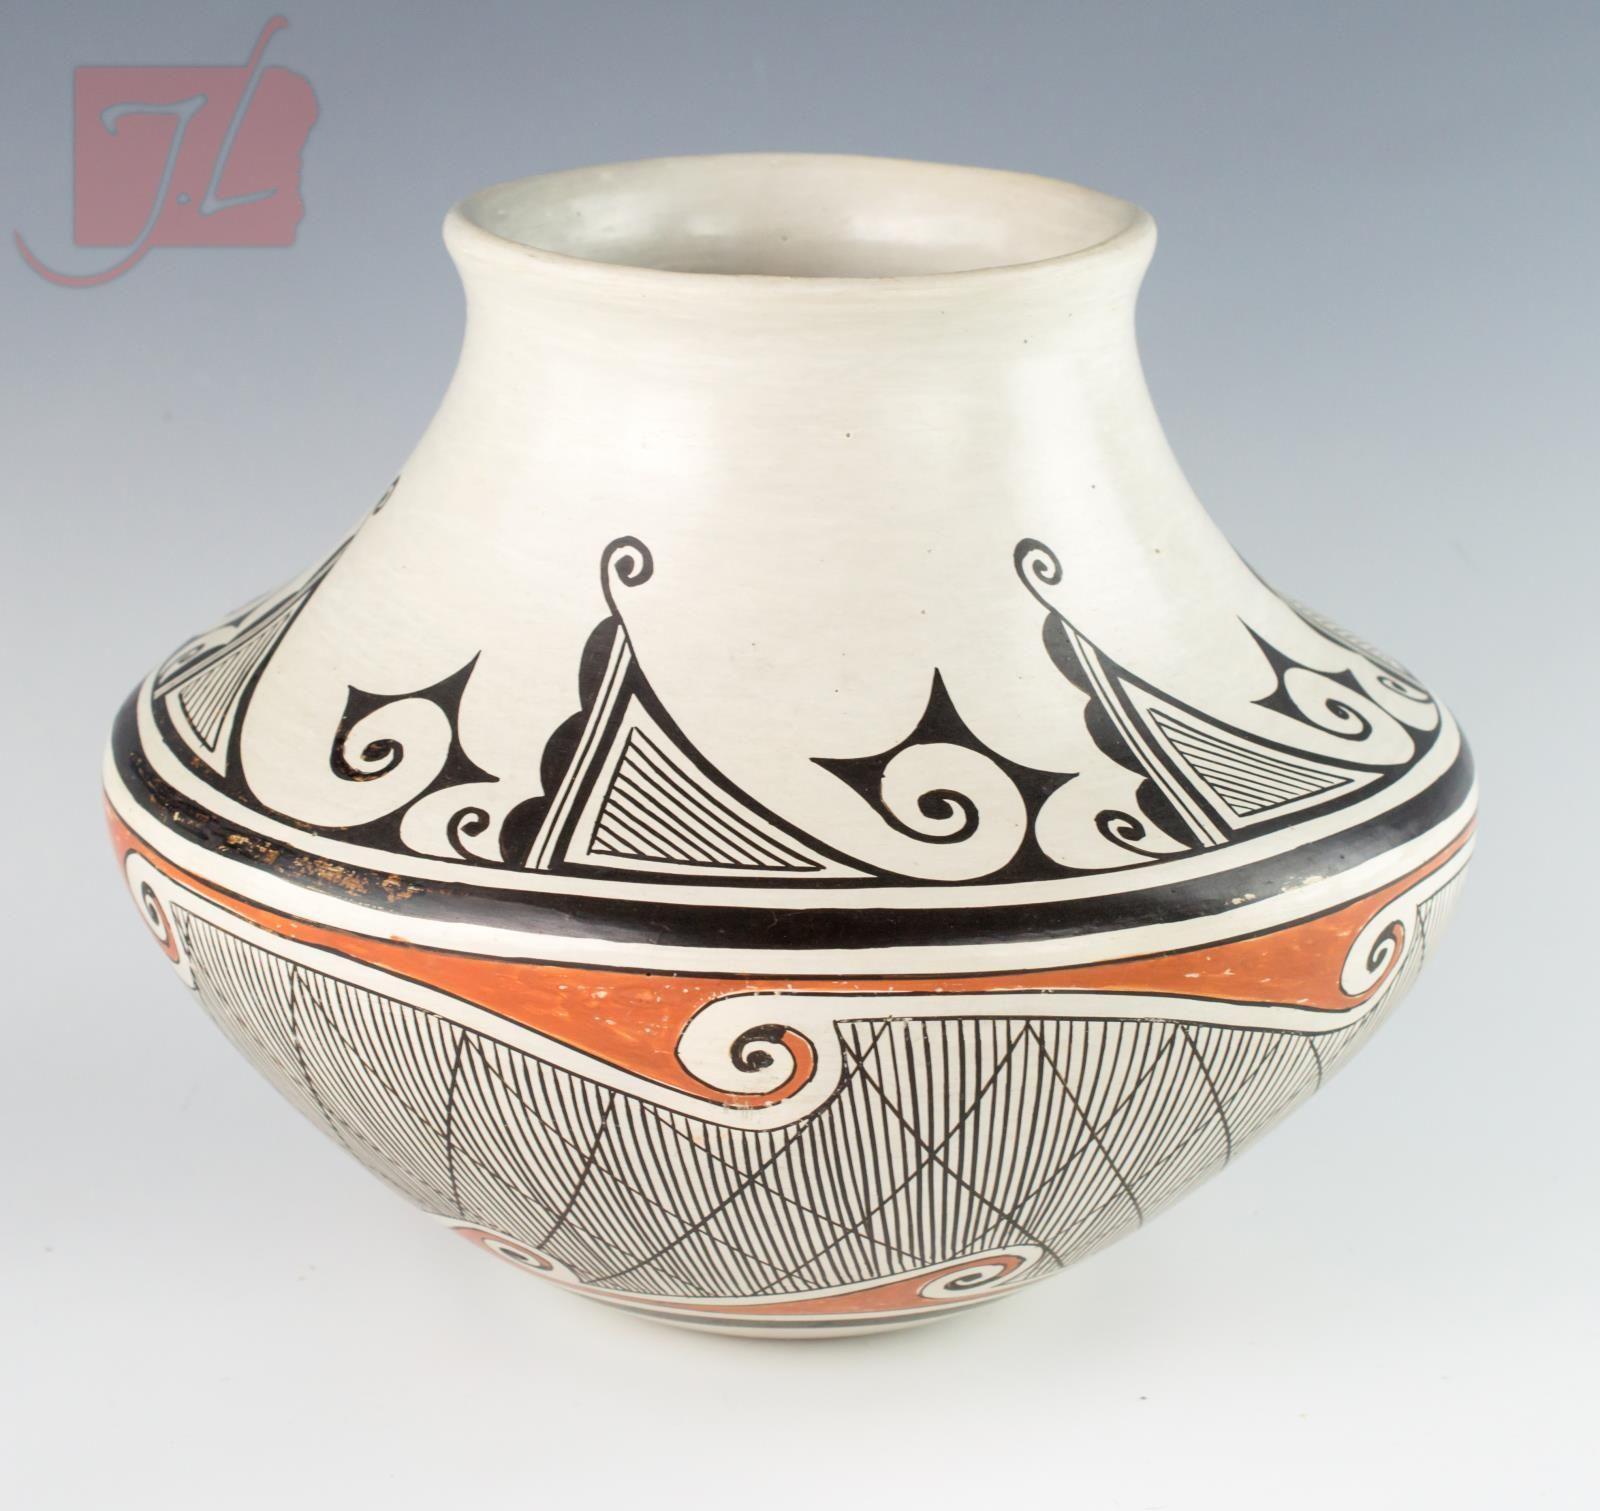 Helen Naha Hopi Pottery Vessel